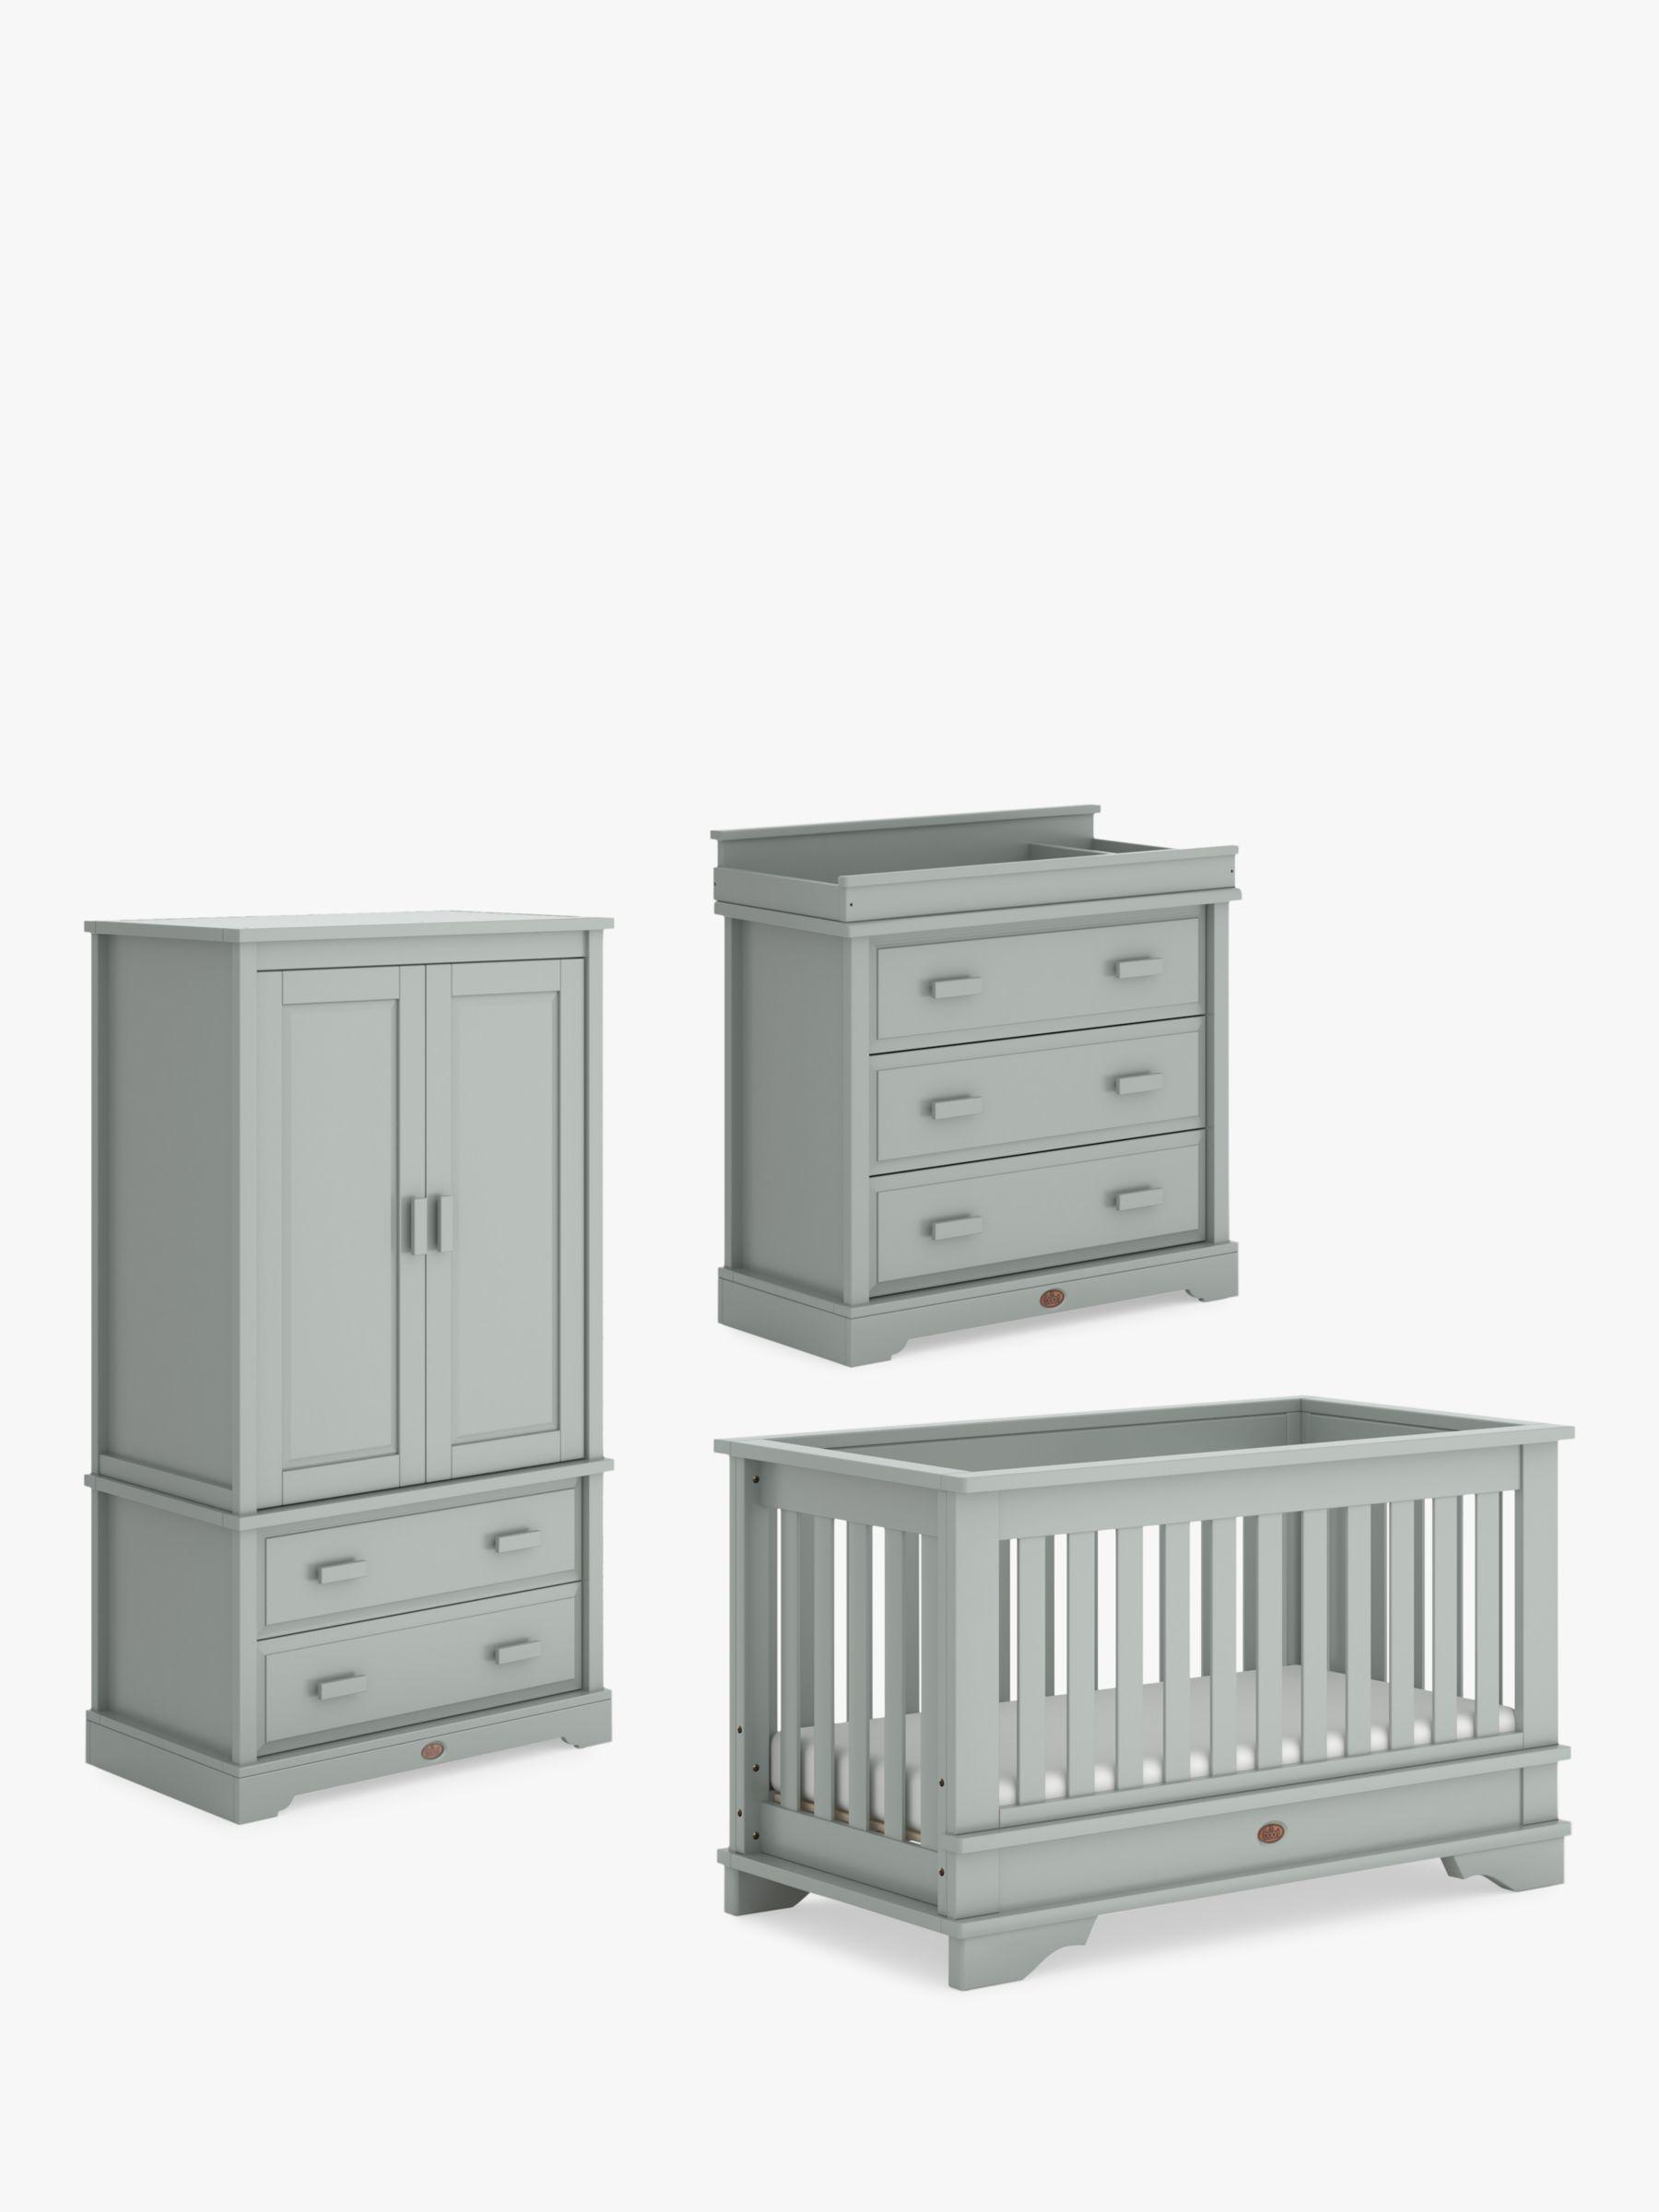 Boori Boori Eton Convertible Cotbed, Wardrobe & Dresser, Pebble Grey